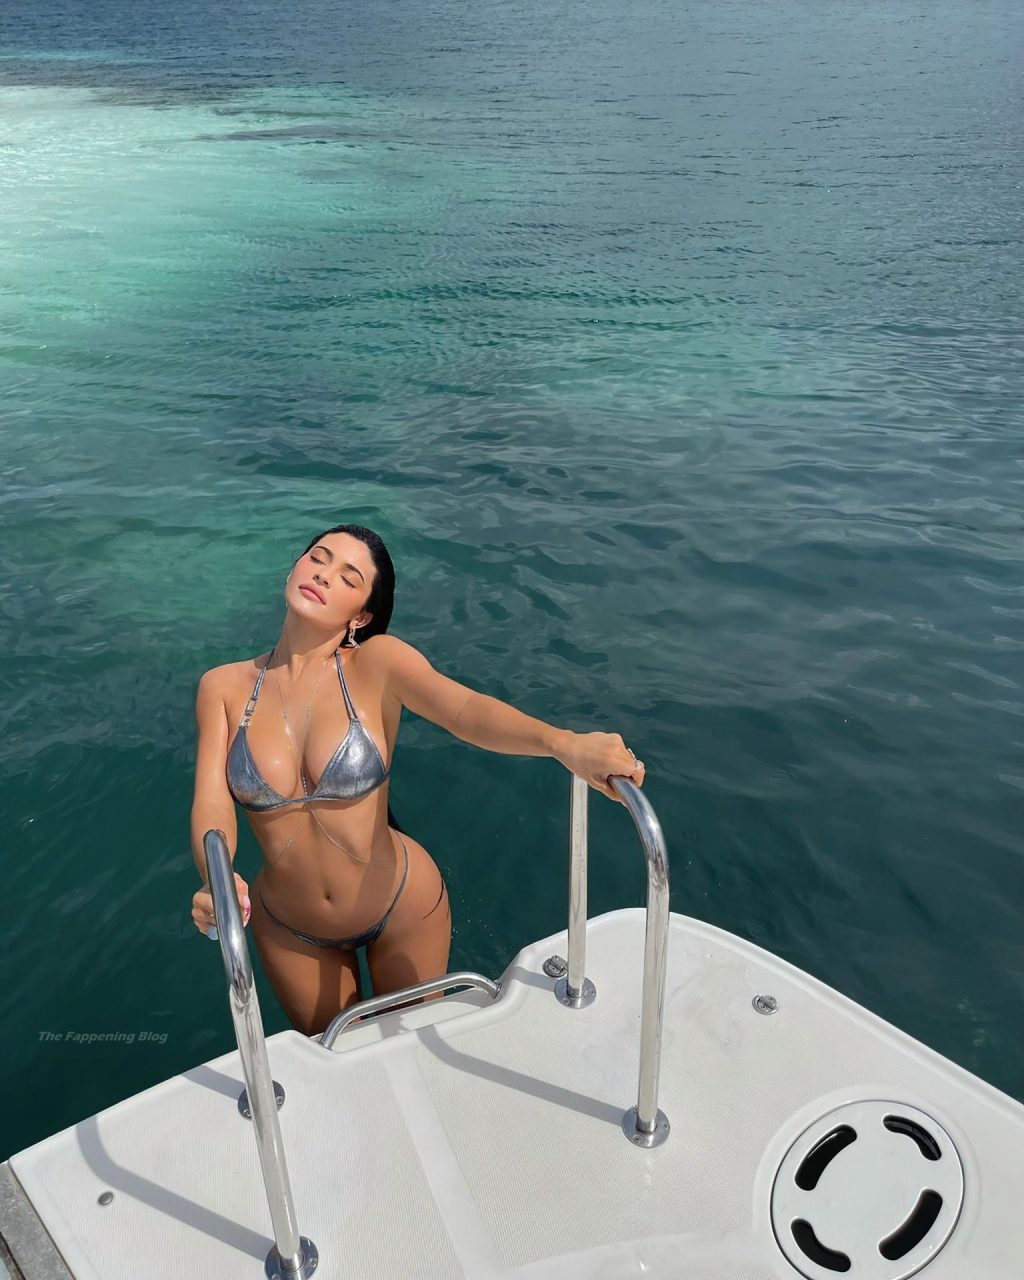 Kylie Jenner Looks Hot in a Bikini (9 Photos)